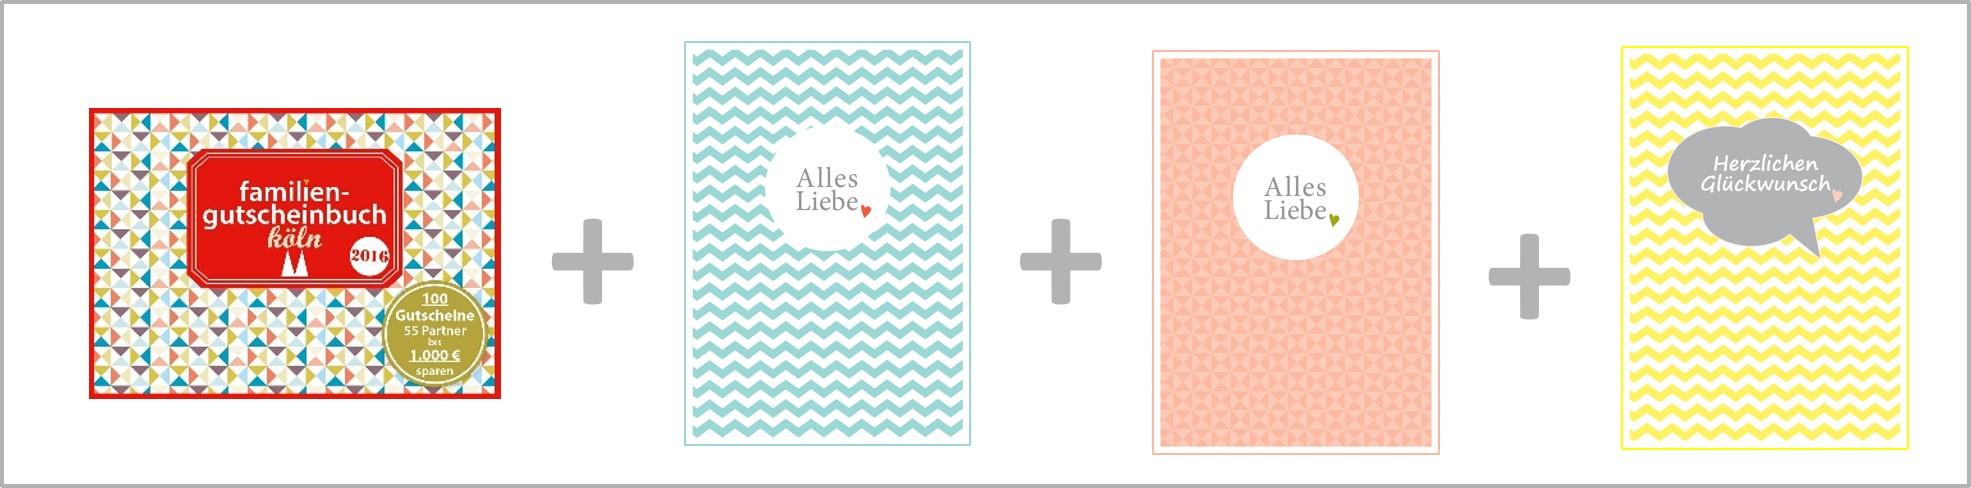 Familiengutscheinbuch Familienpostkarten Köln - Kurse & Wellness familiengutscheinbuch köln